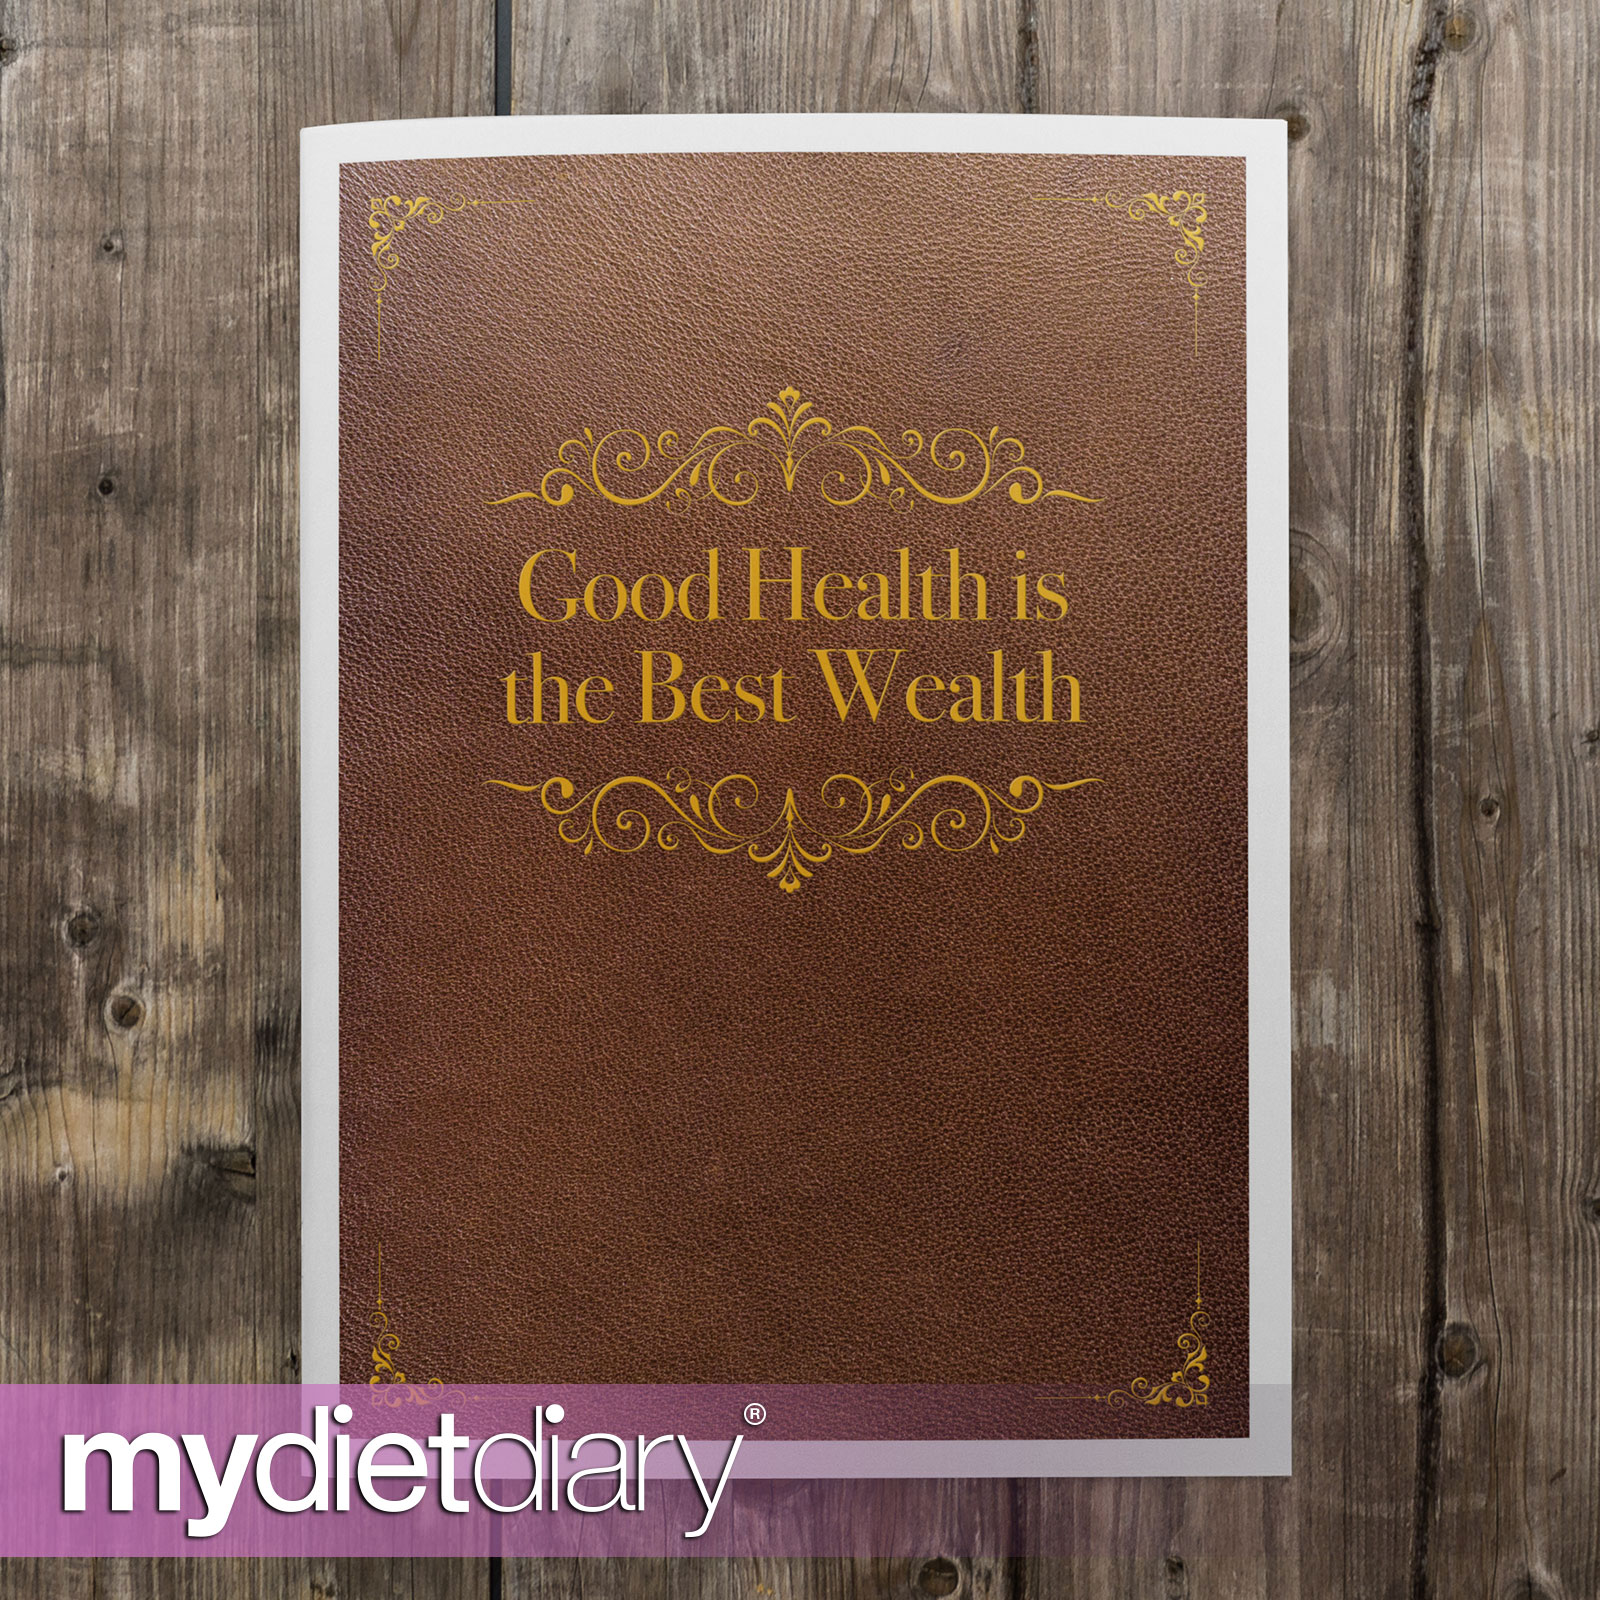 DIET-DIARY-Meal-Planner-Weight-Loss-Tracker-Journal-Diet-Diary-Slimming-7week